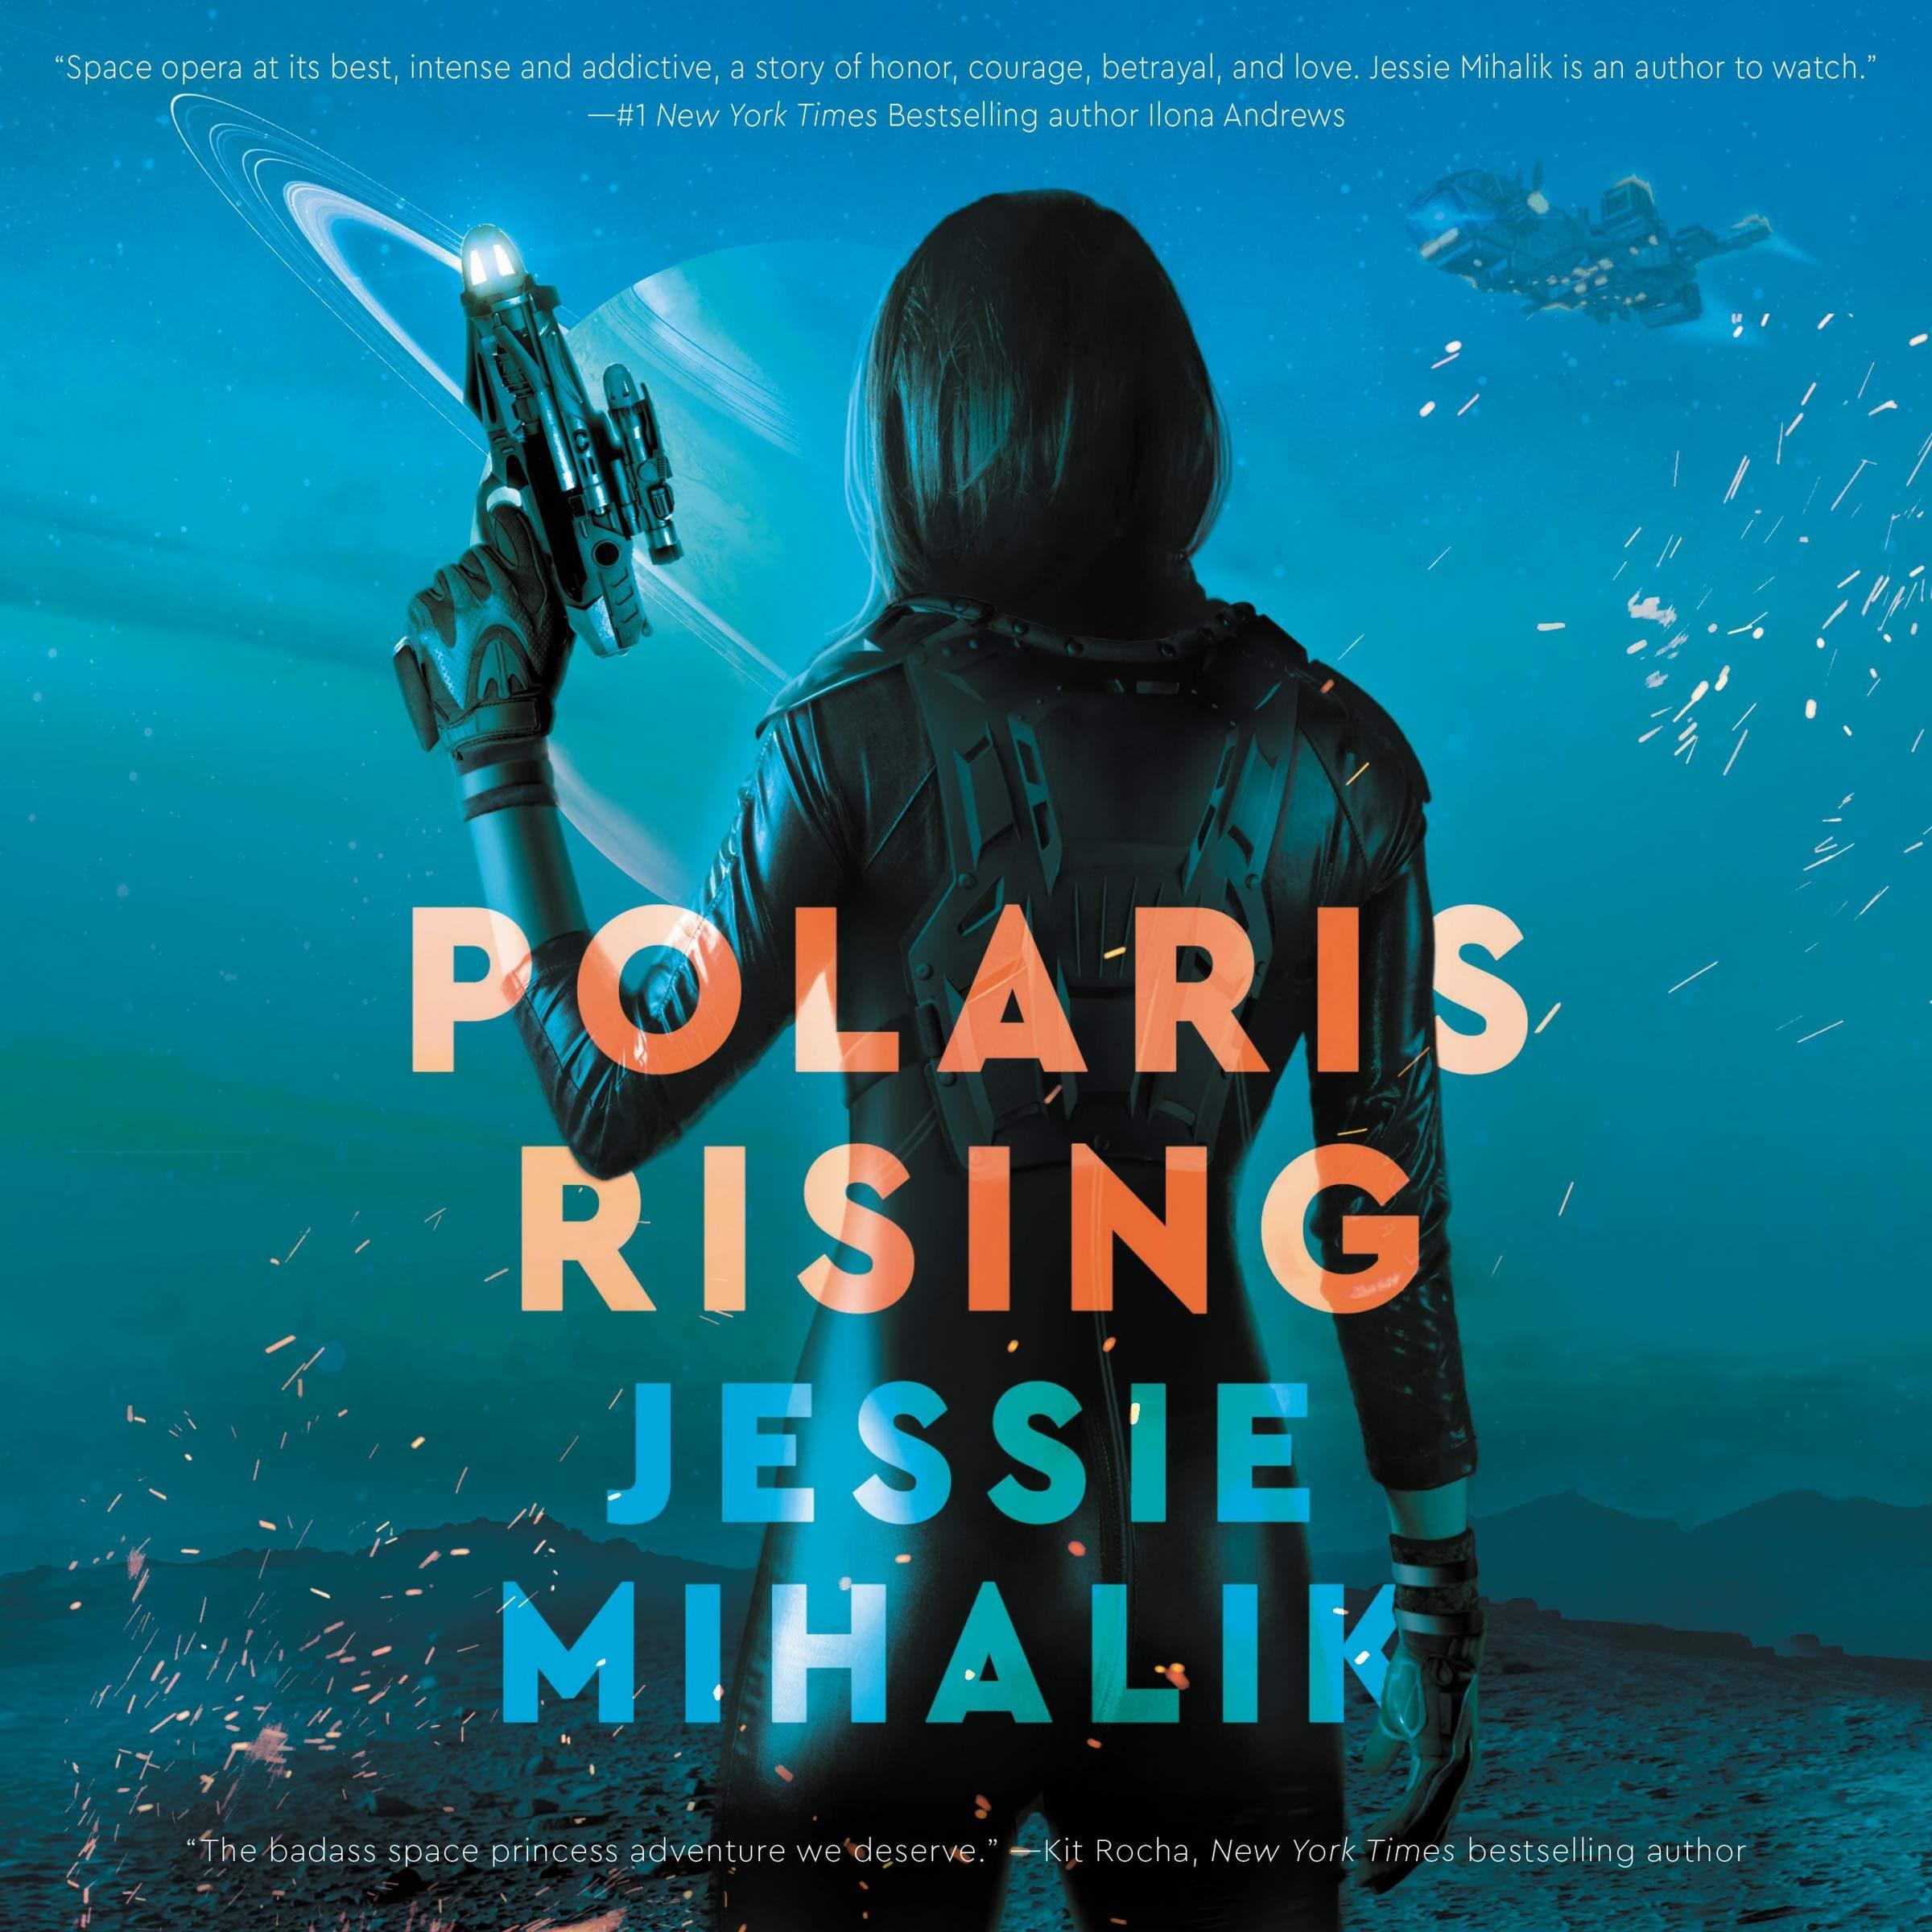 Polaris Rising: A Novel by HarperCollins and Blackstone Audio